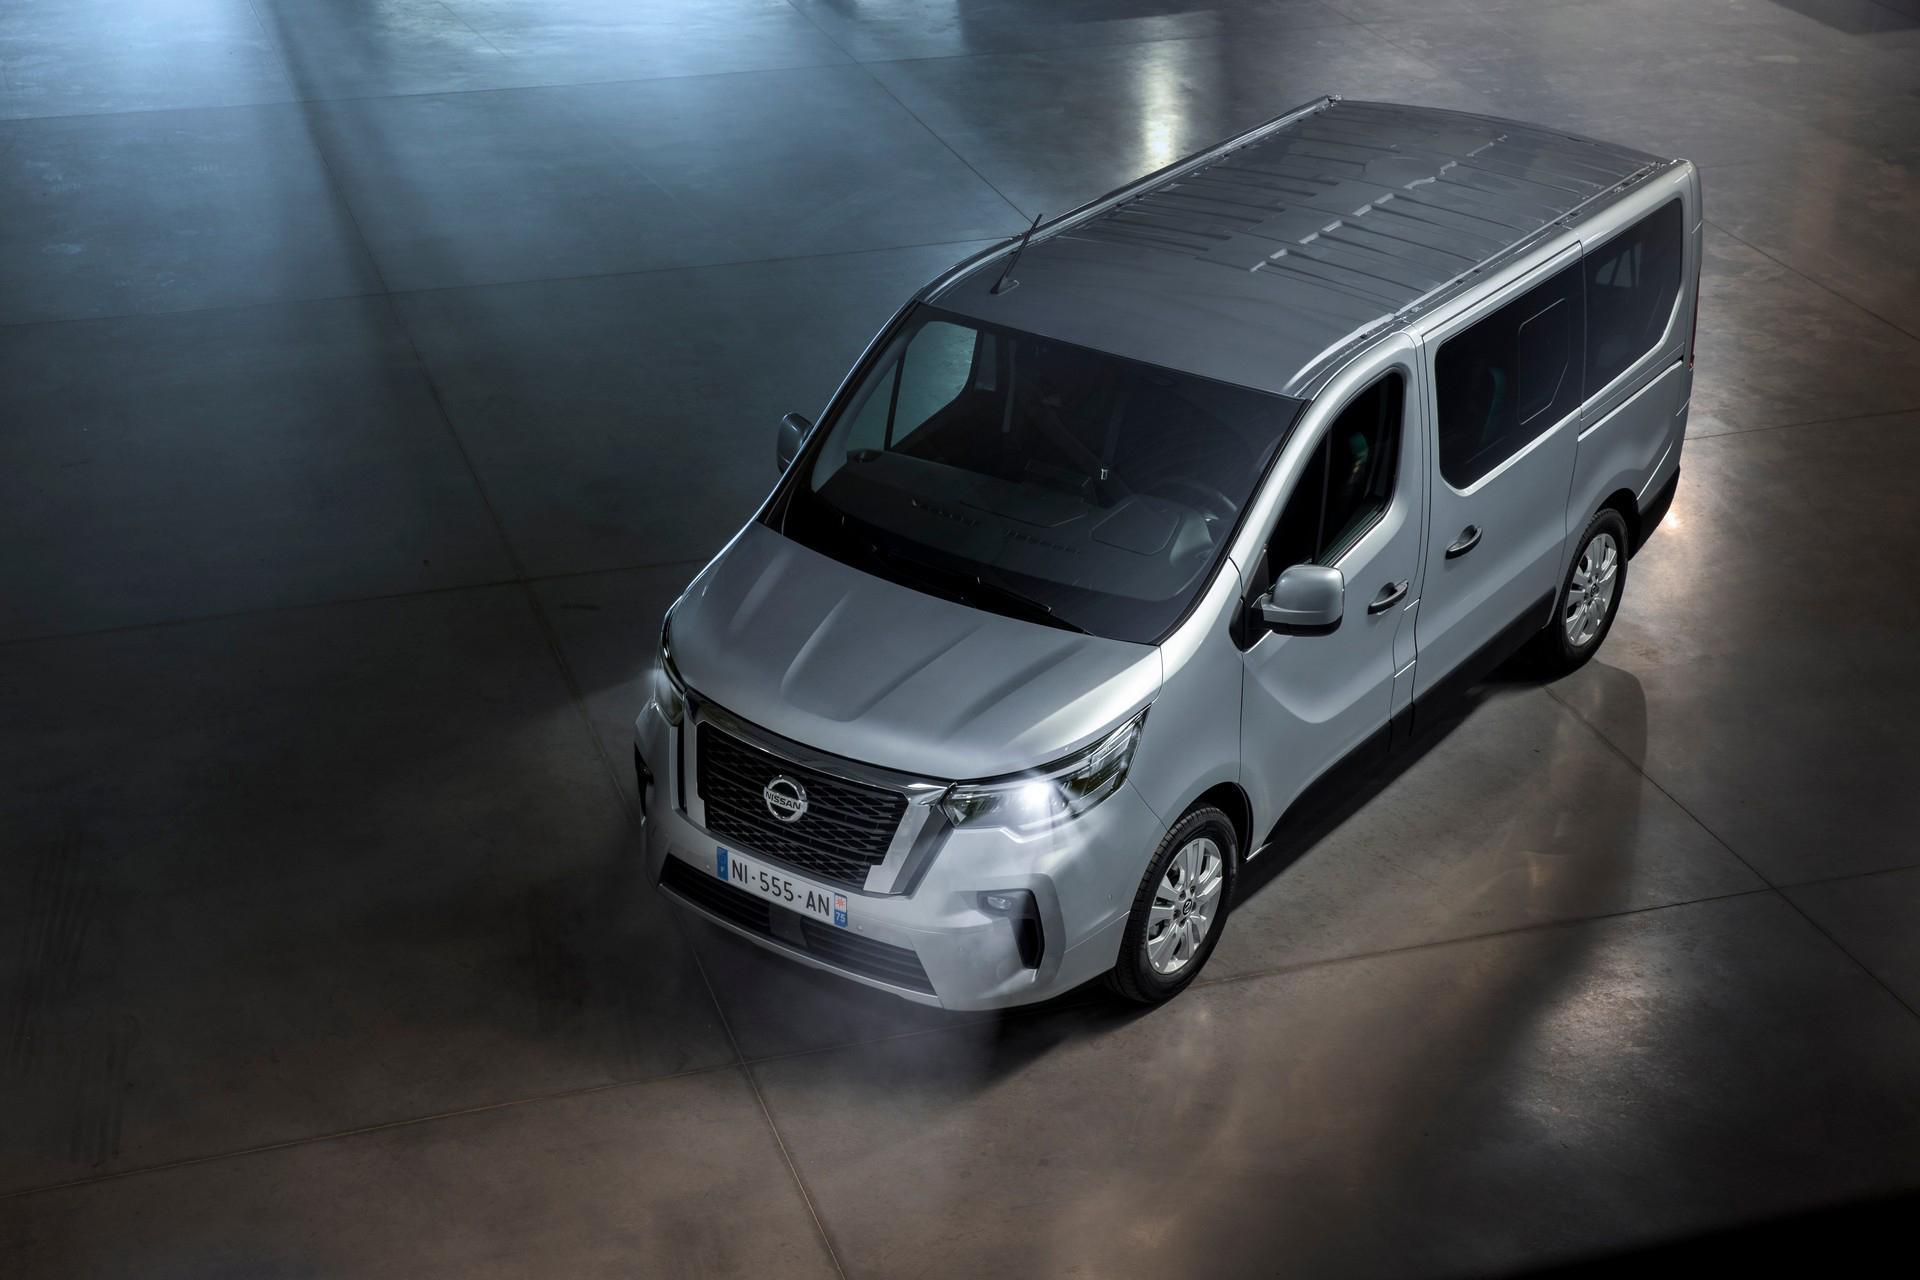 Nissan a prezentat autoutilitara de persoane NV300 Combi facelift